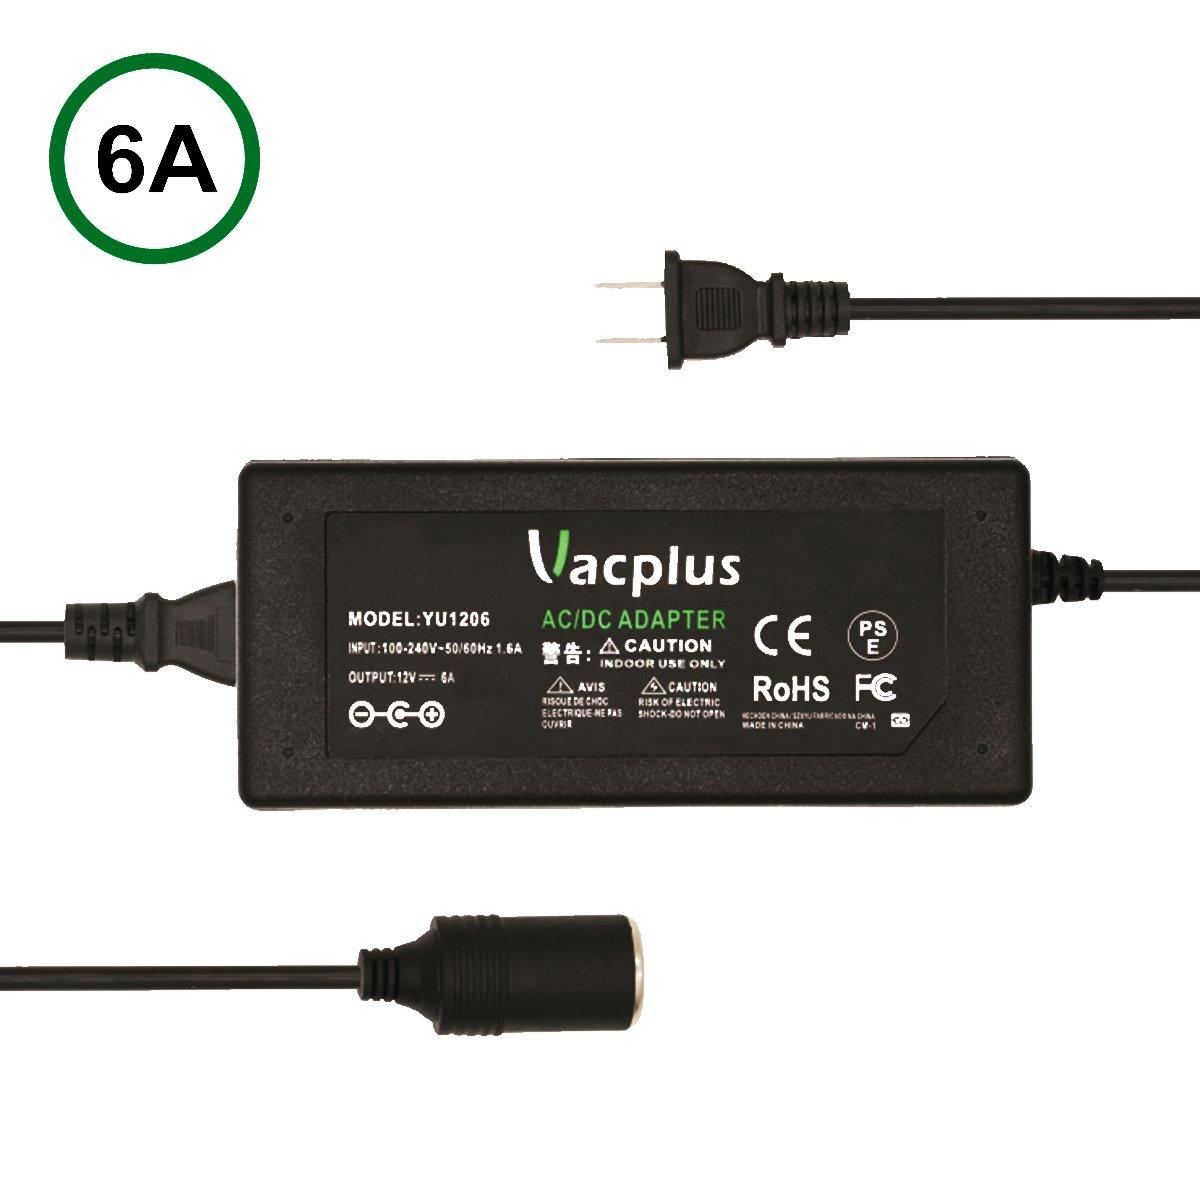 Amazon.com: AC to DC Converter, Vacplus 6A 72W 110V to 12V AC/DC ...